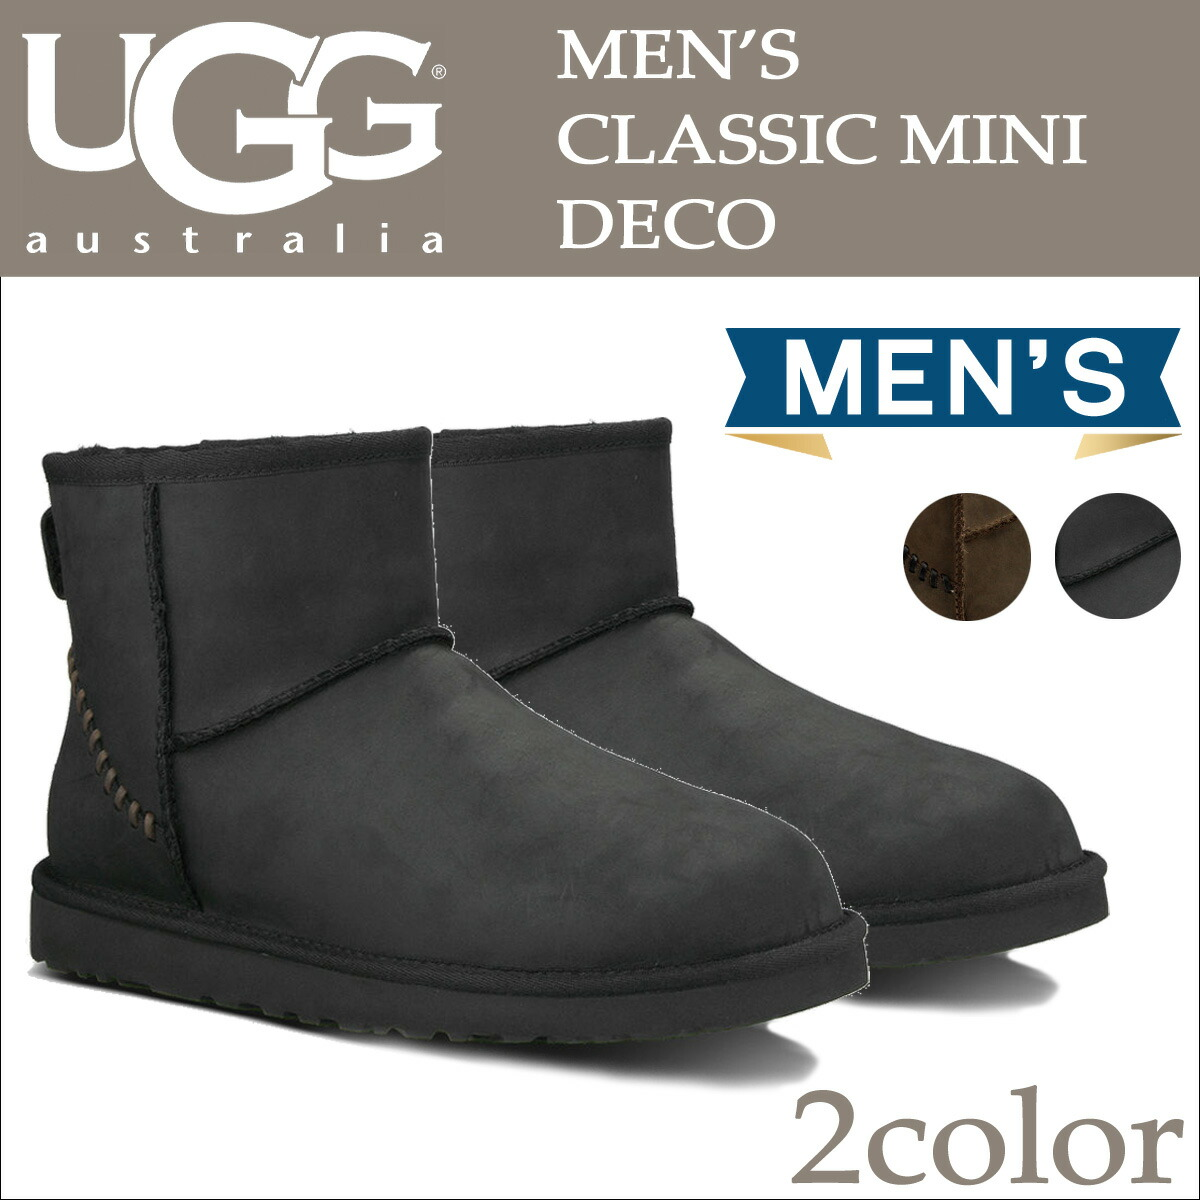 92672c892d9 アグ UGG men classical music mini-mouton boots MENS CLASSIC MINI DECO 1003945